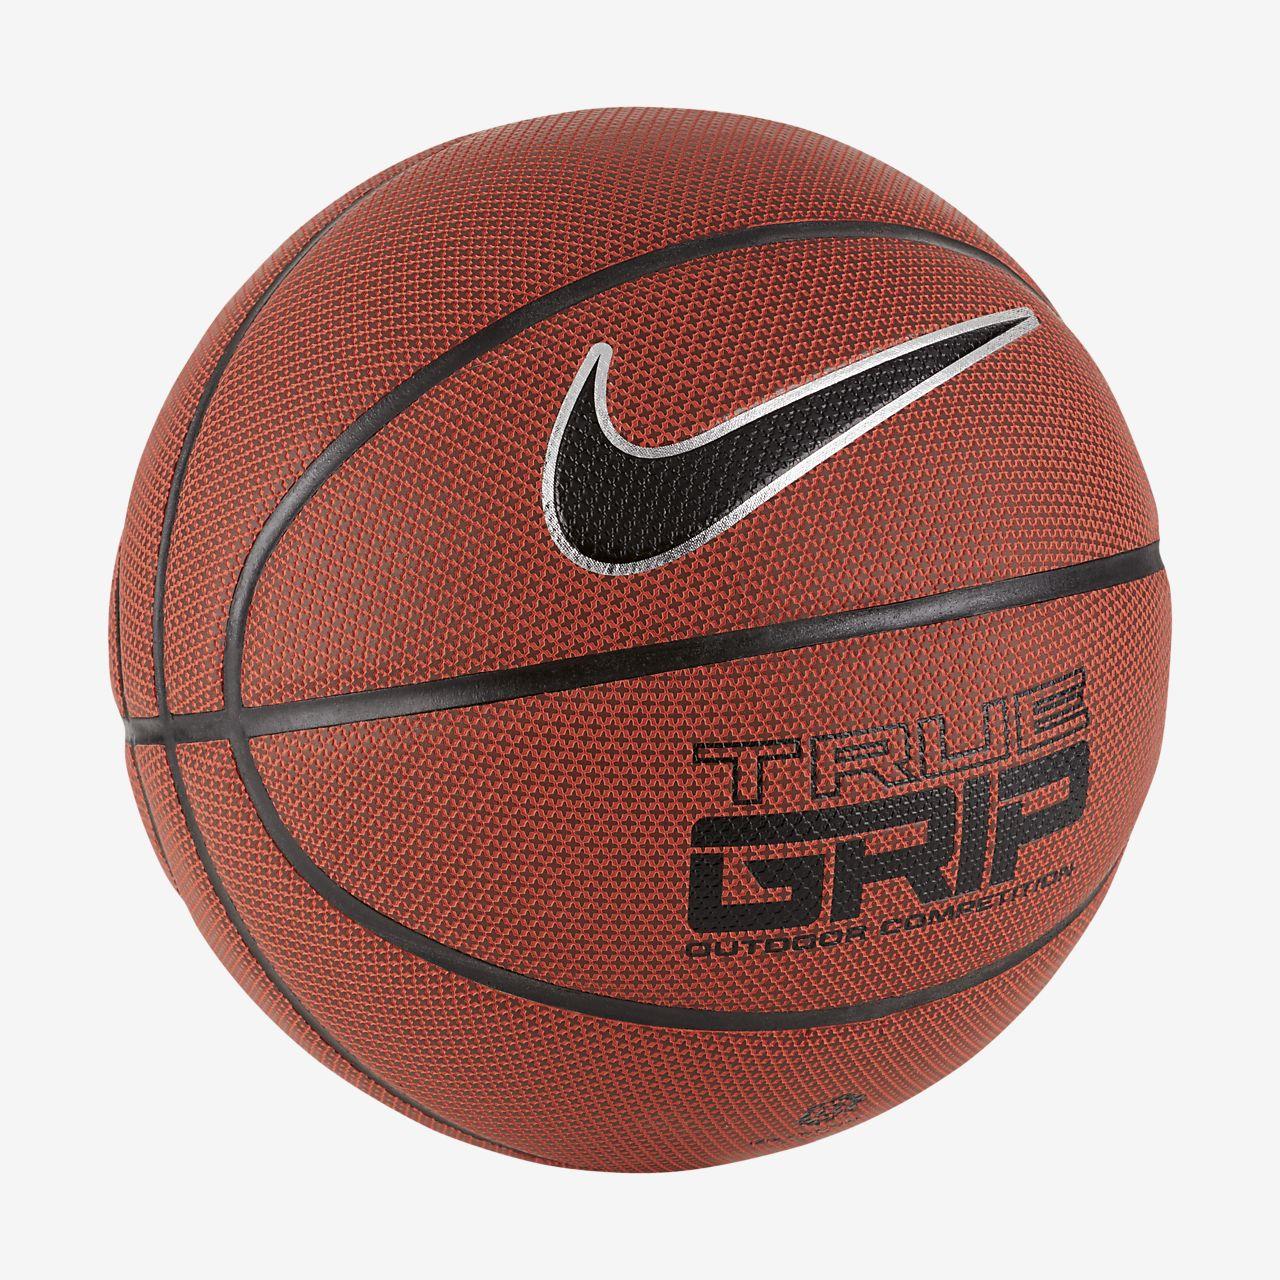 Nike Basketball Ballon True Fr 8p De Outdoor Grip 1Anw4q